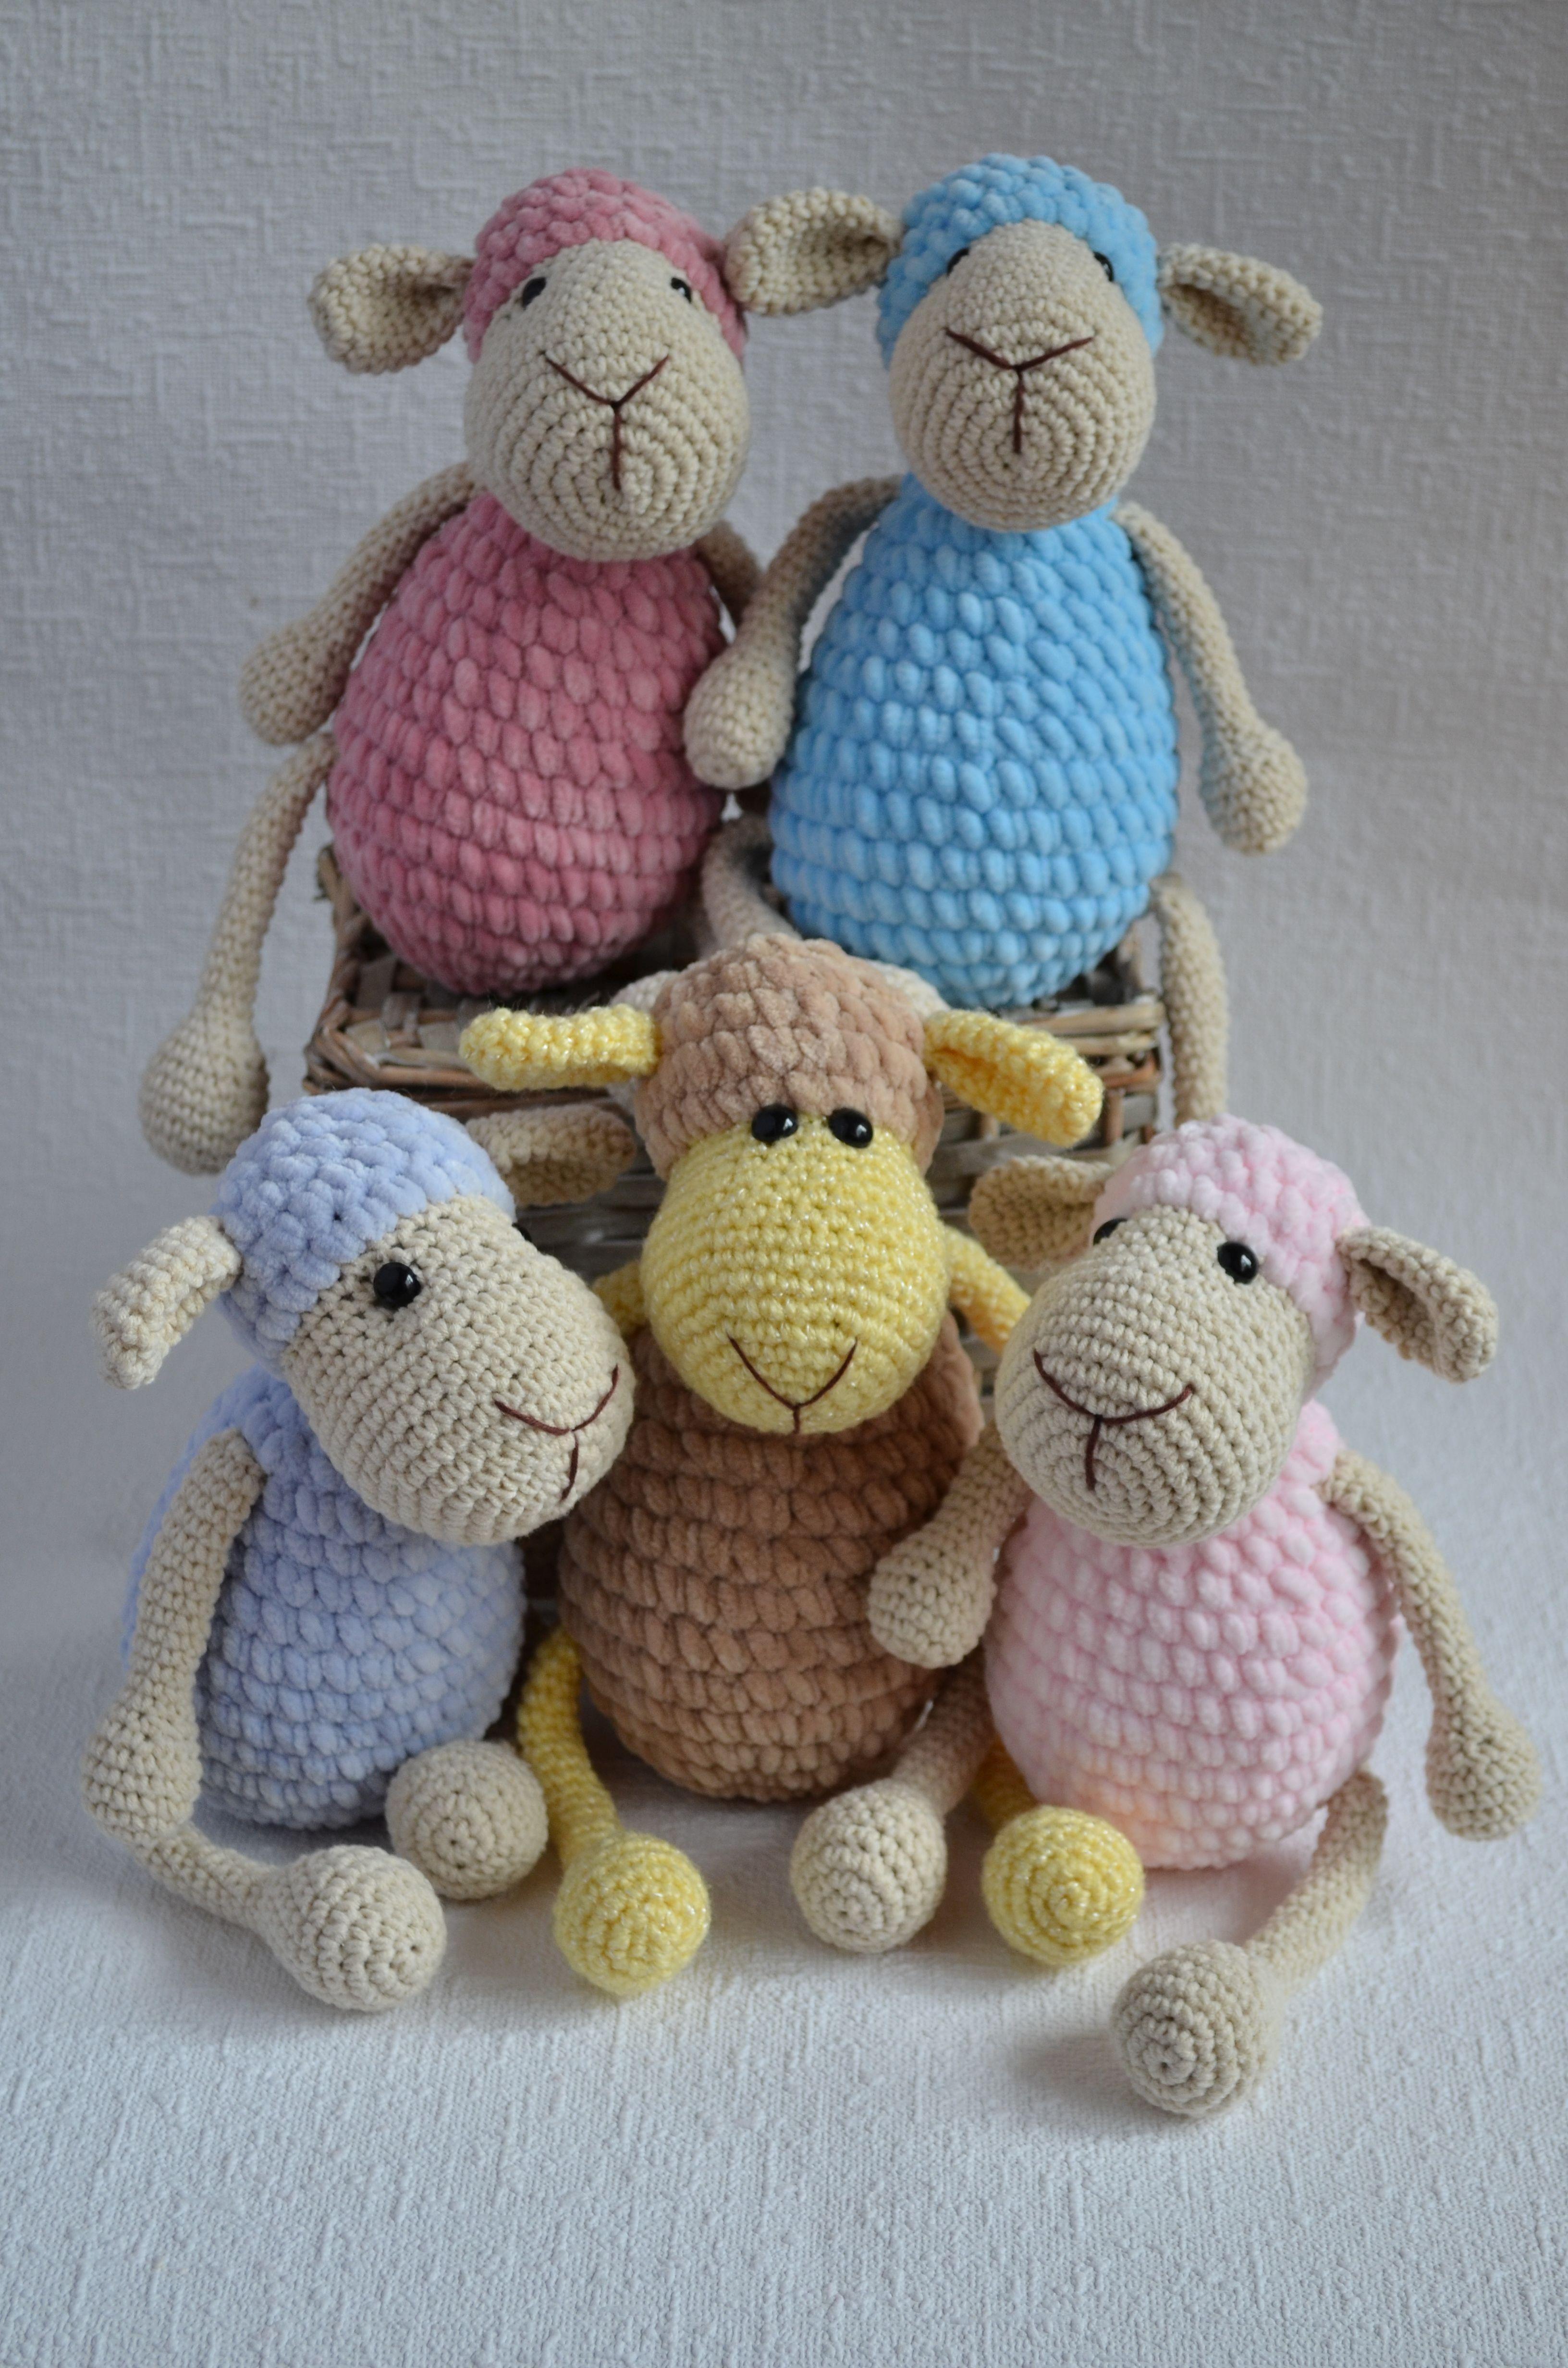 Sheep baby toy, Sheep plush toy, Stuffed animals, Crochet